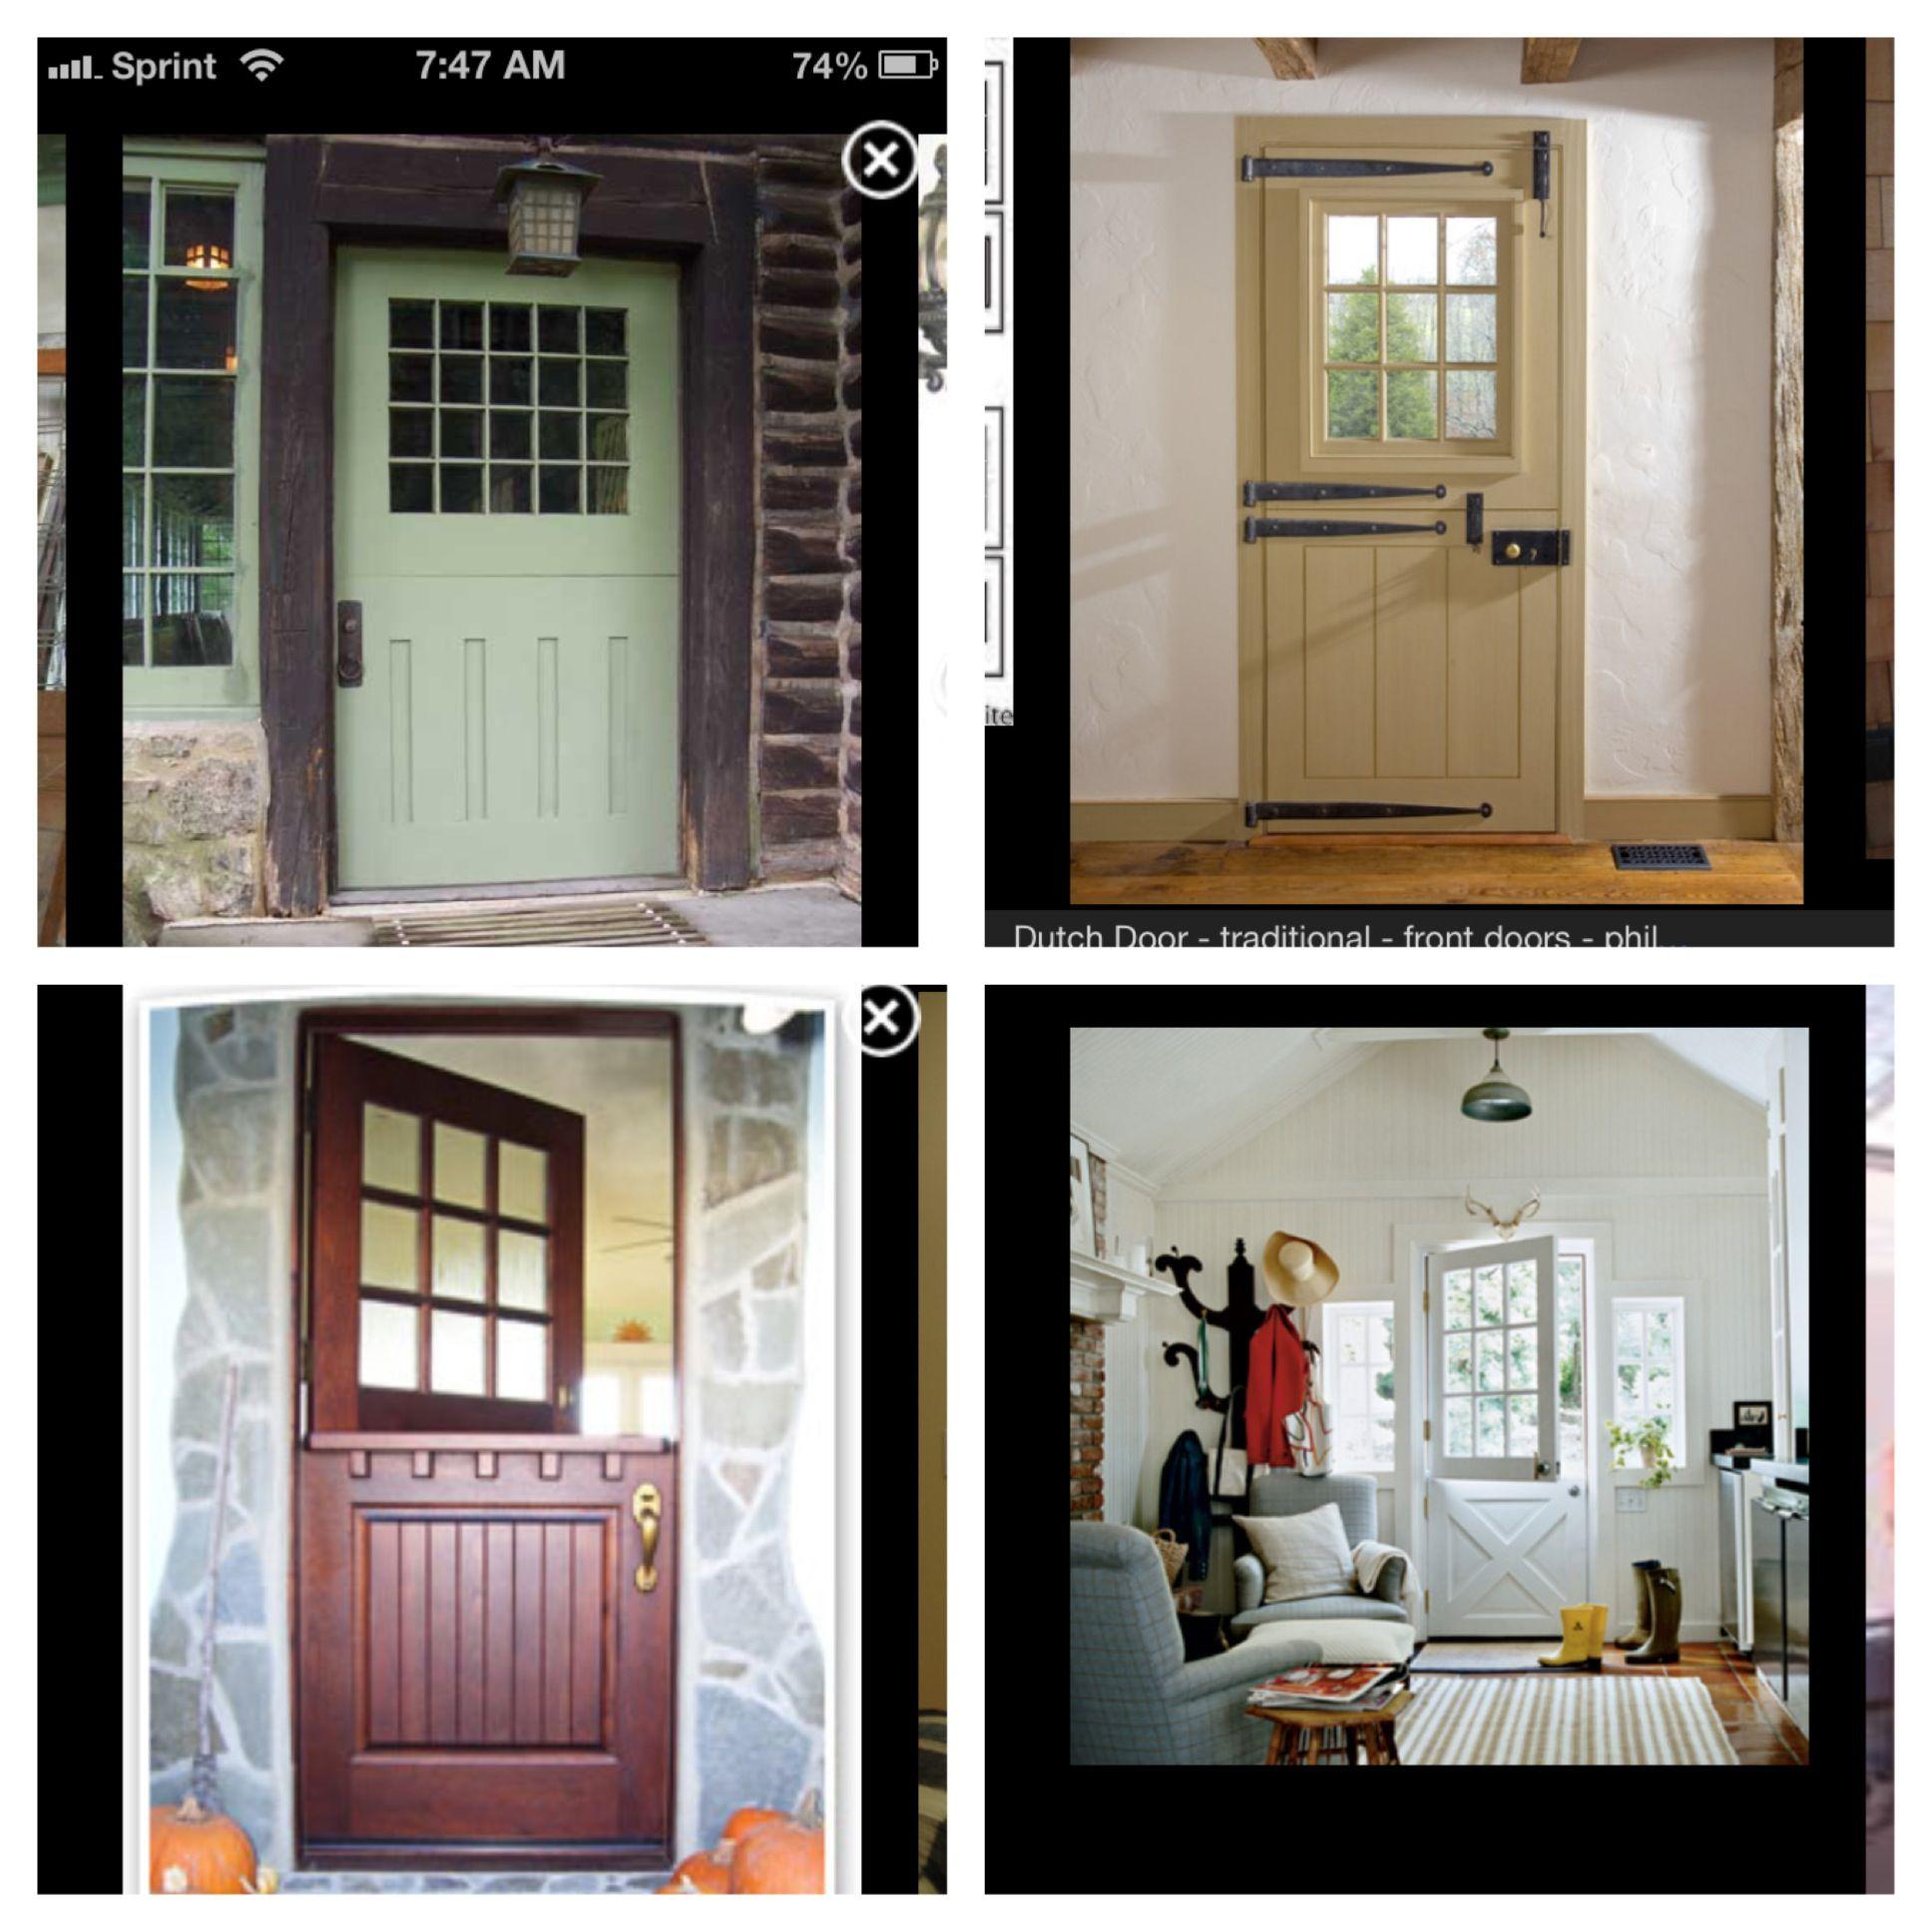 Dutch doors (craftsman style) | my craftsman home :) | Pinterest ...